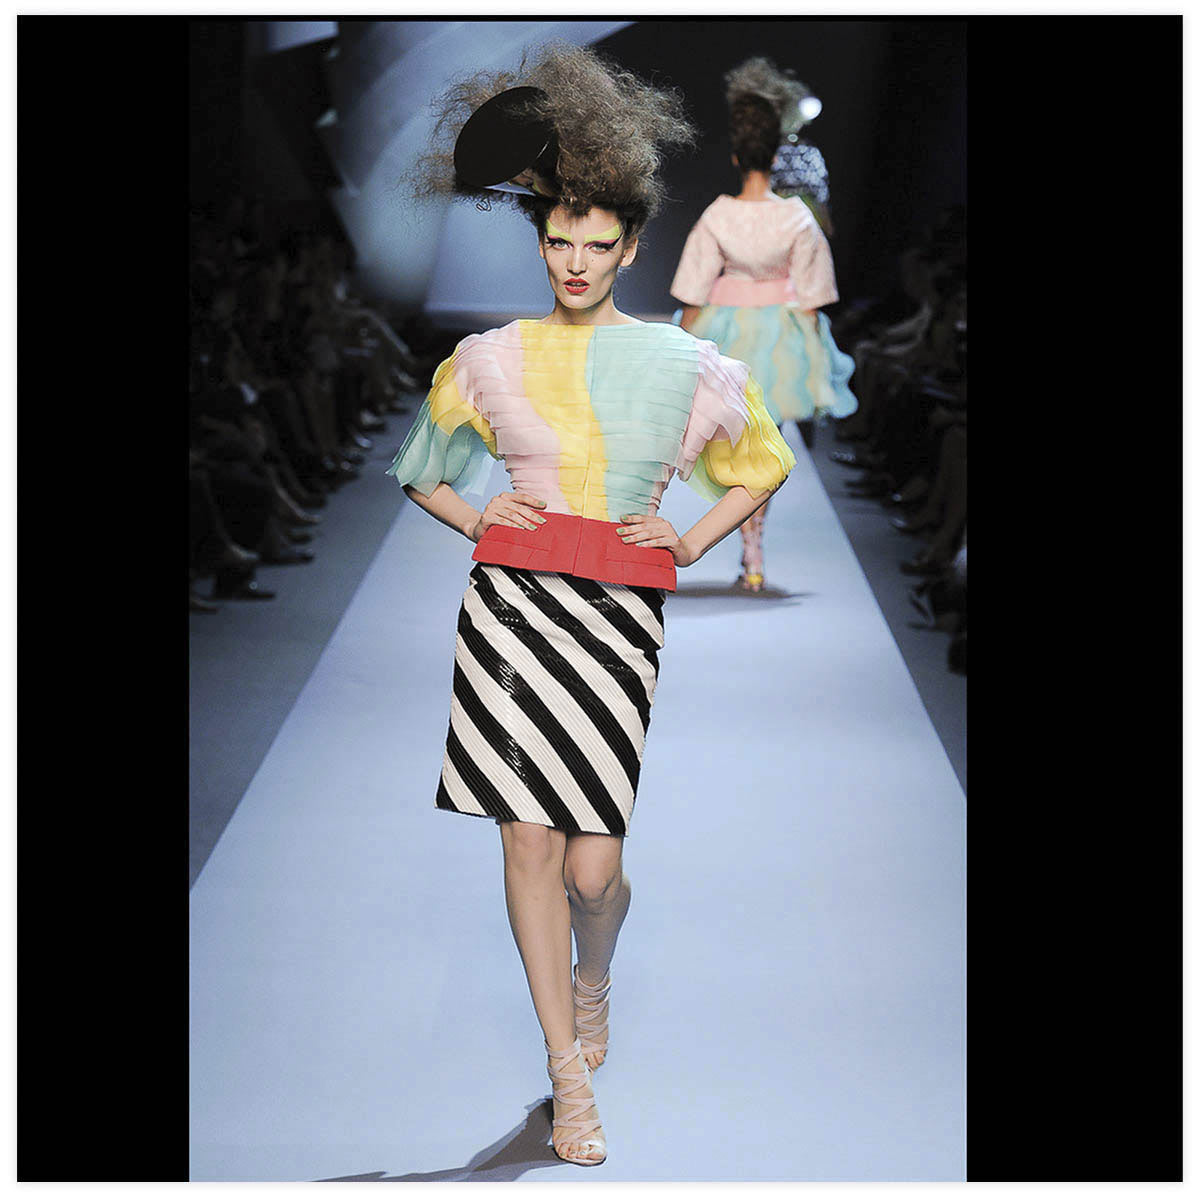 Christian Dior Haute-Couture Défilé 2011 Styliste B. Gayten Aérographe sur cuir